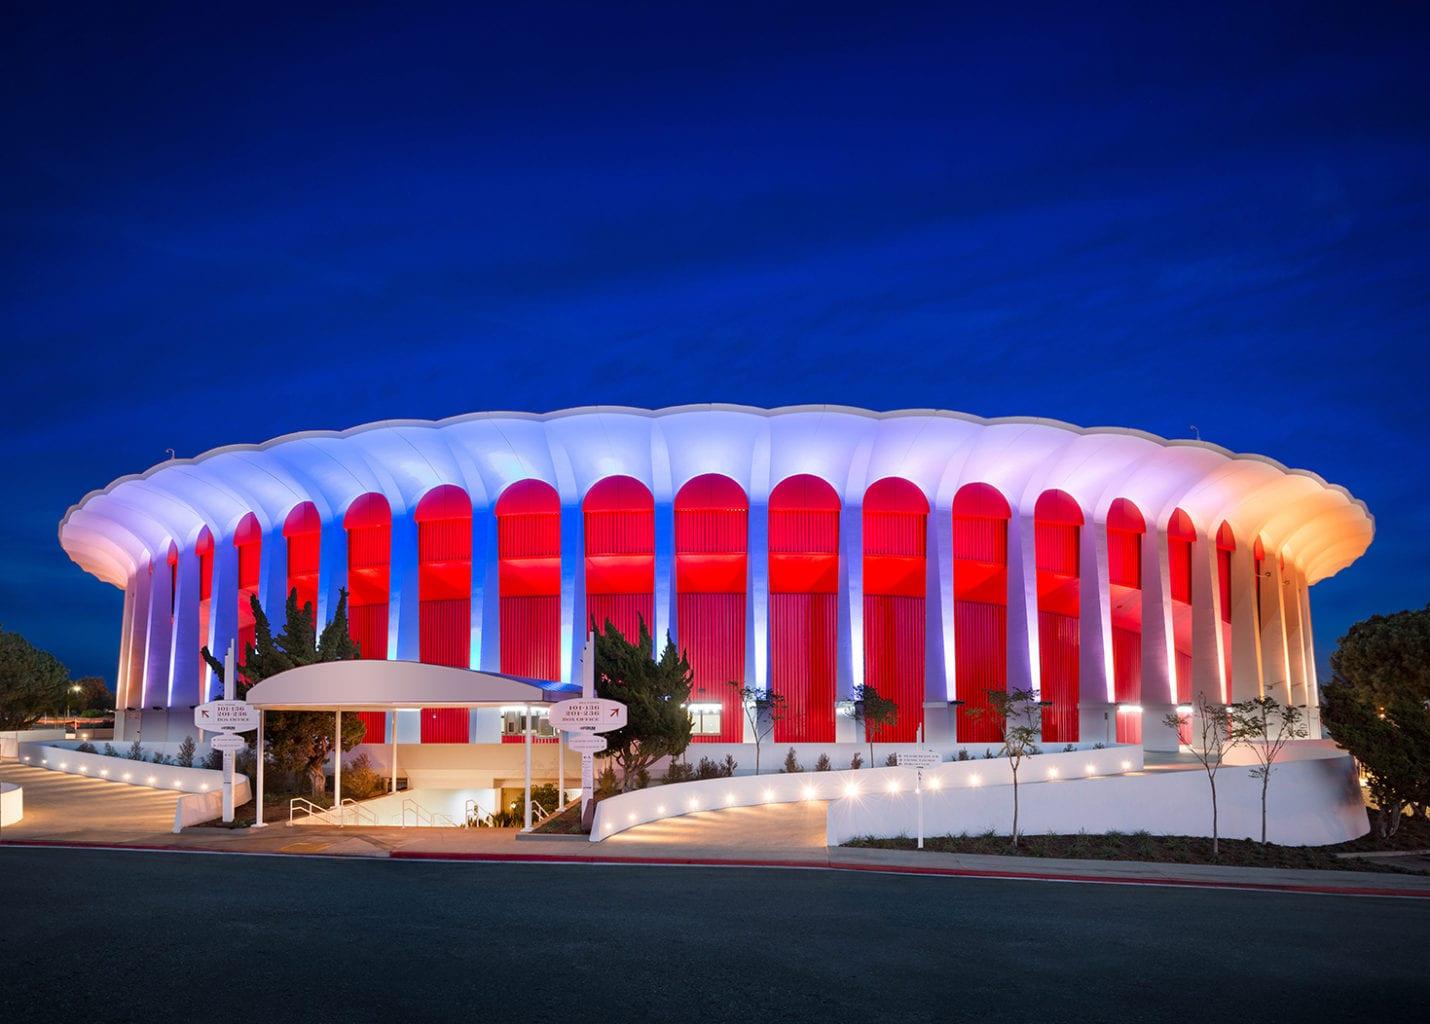 The Forum in Inglewood California.